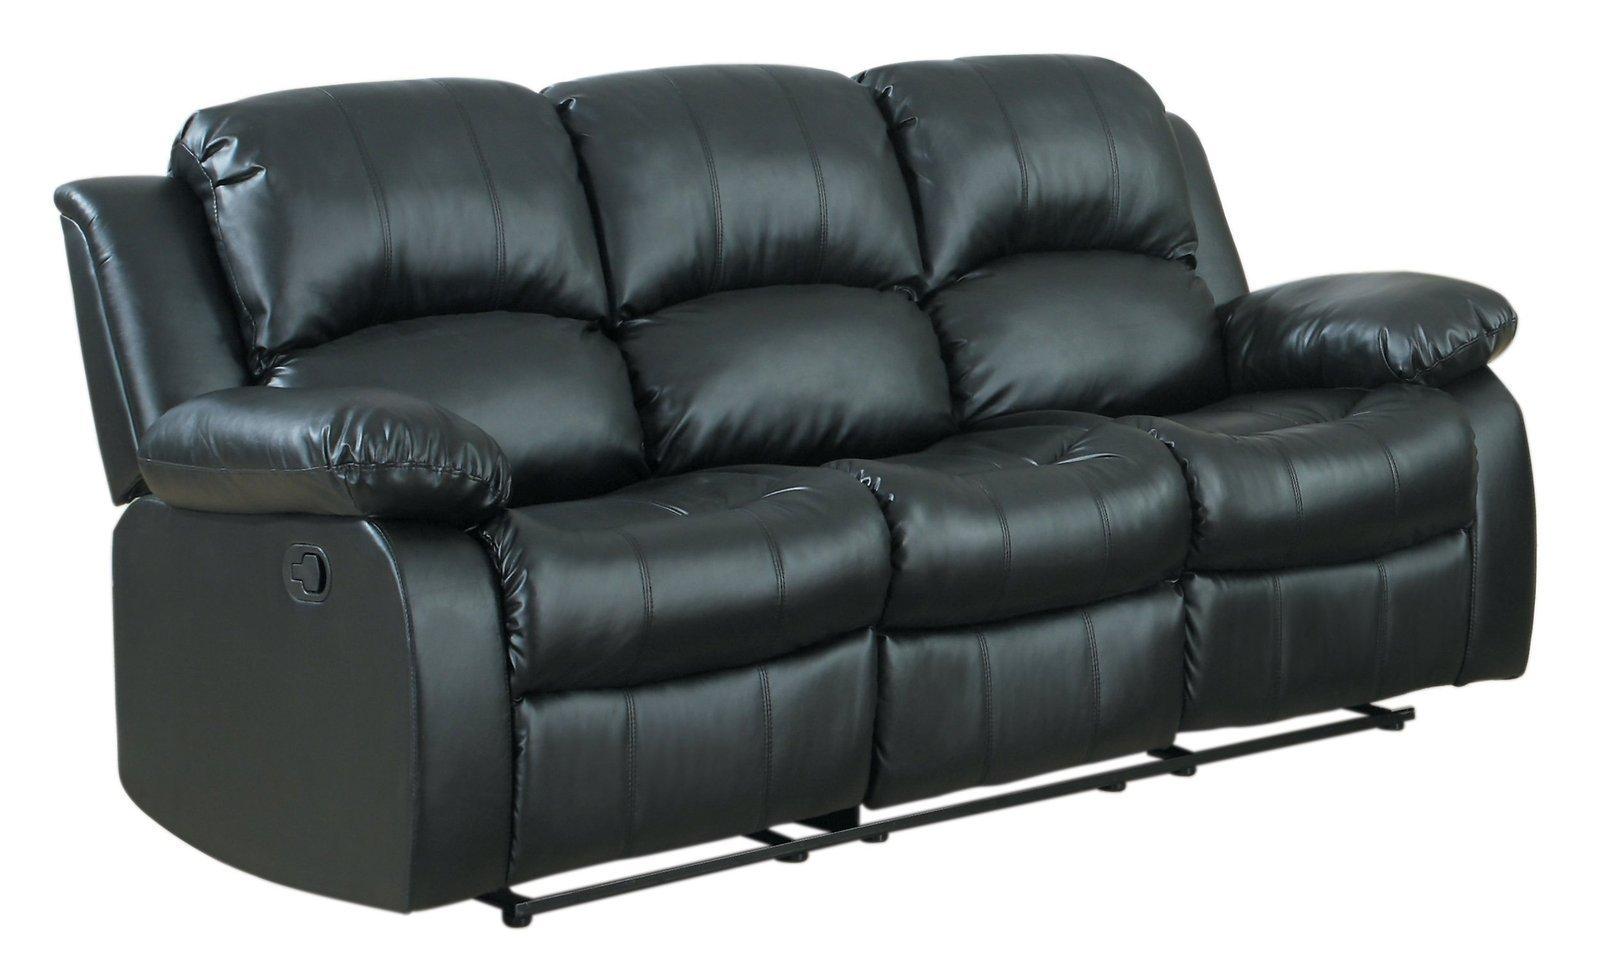 "Homelegance Resonance 83"" Bonded Leather Double Reclining Sofa, Black - $1,367.19"